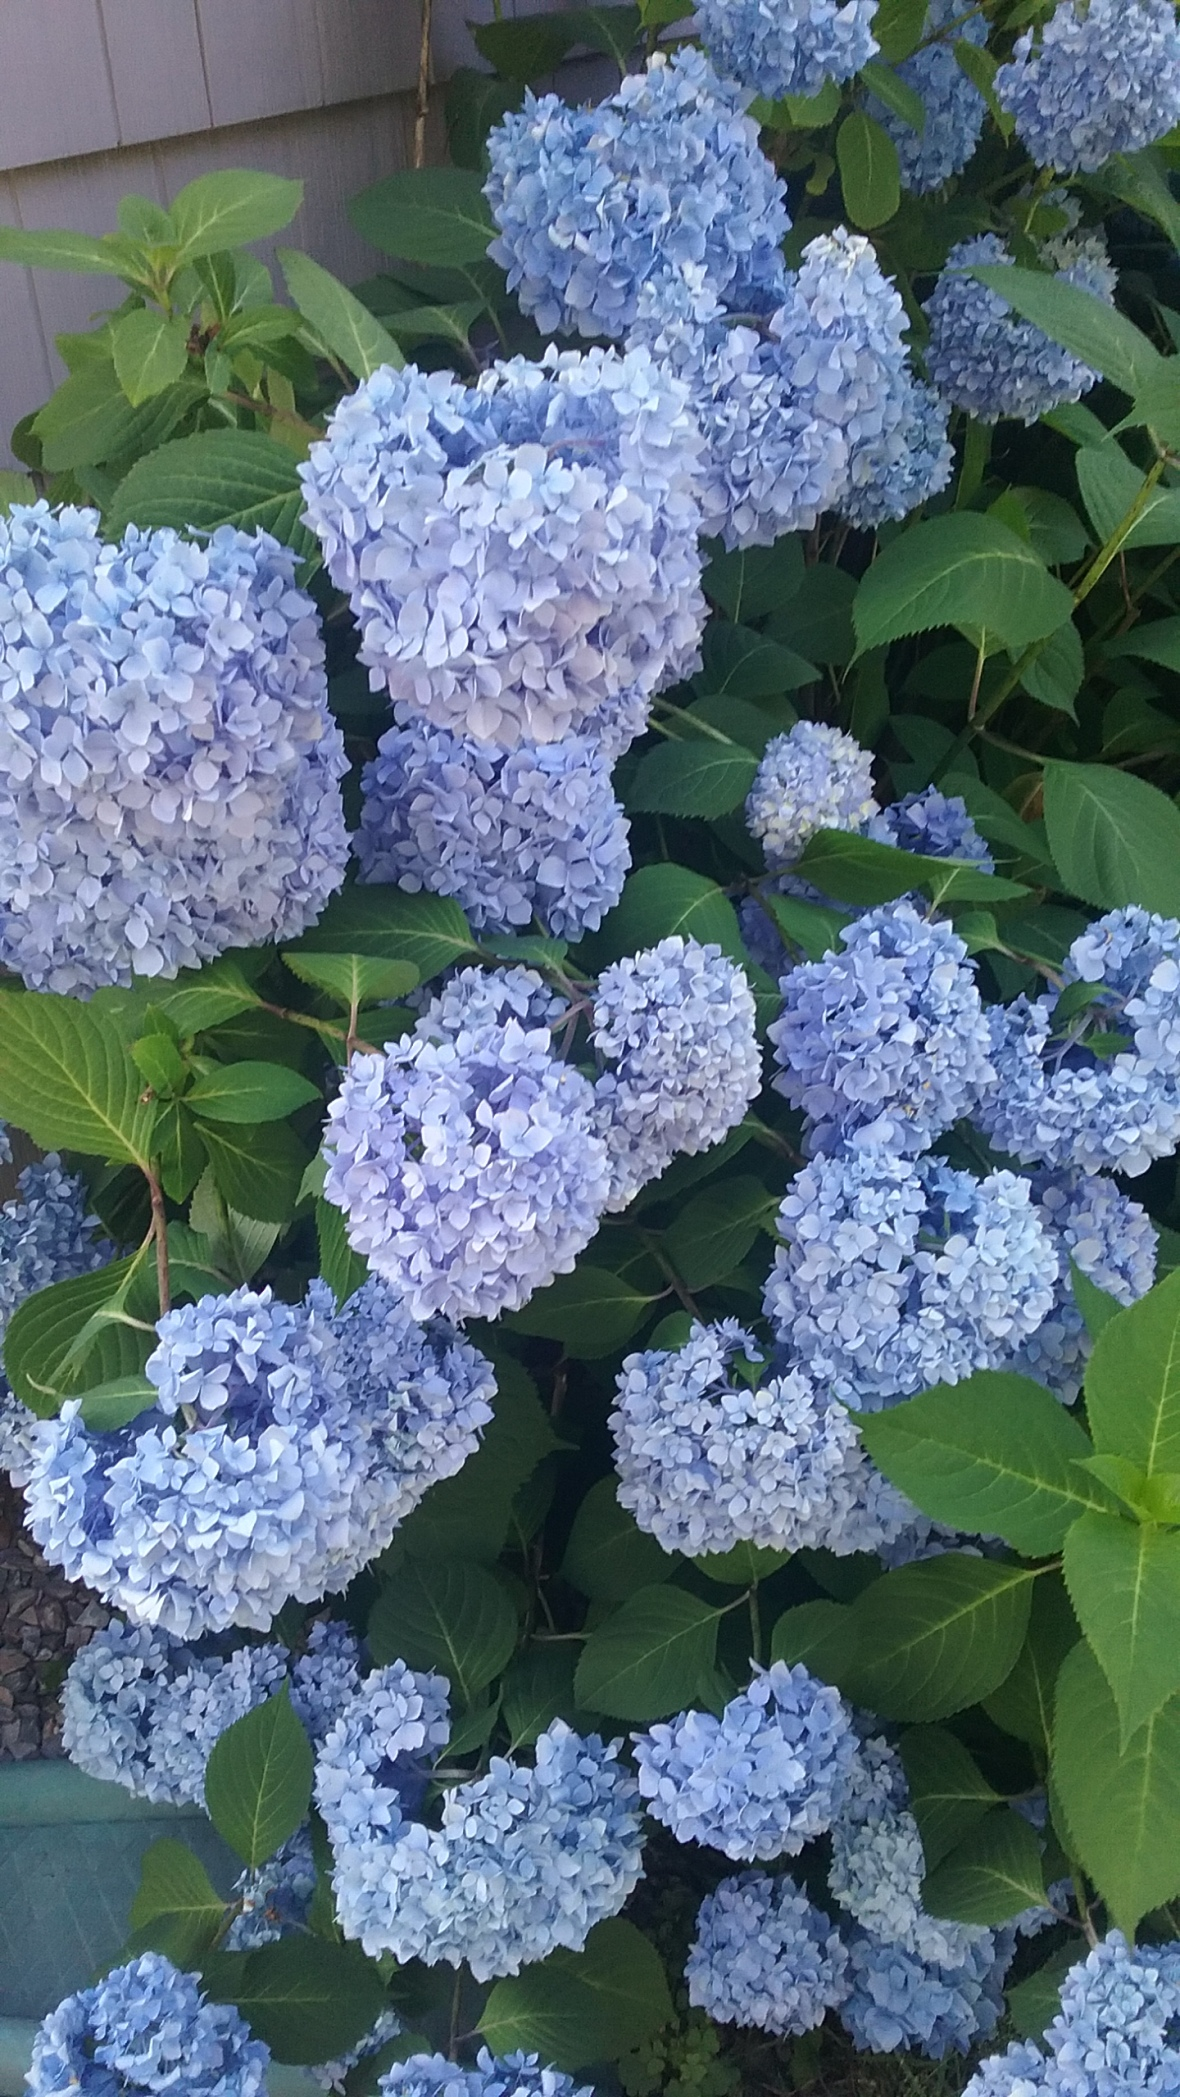 hydrangea-paulette-ryan